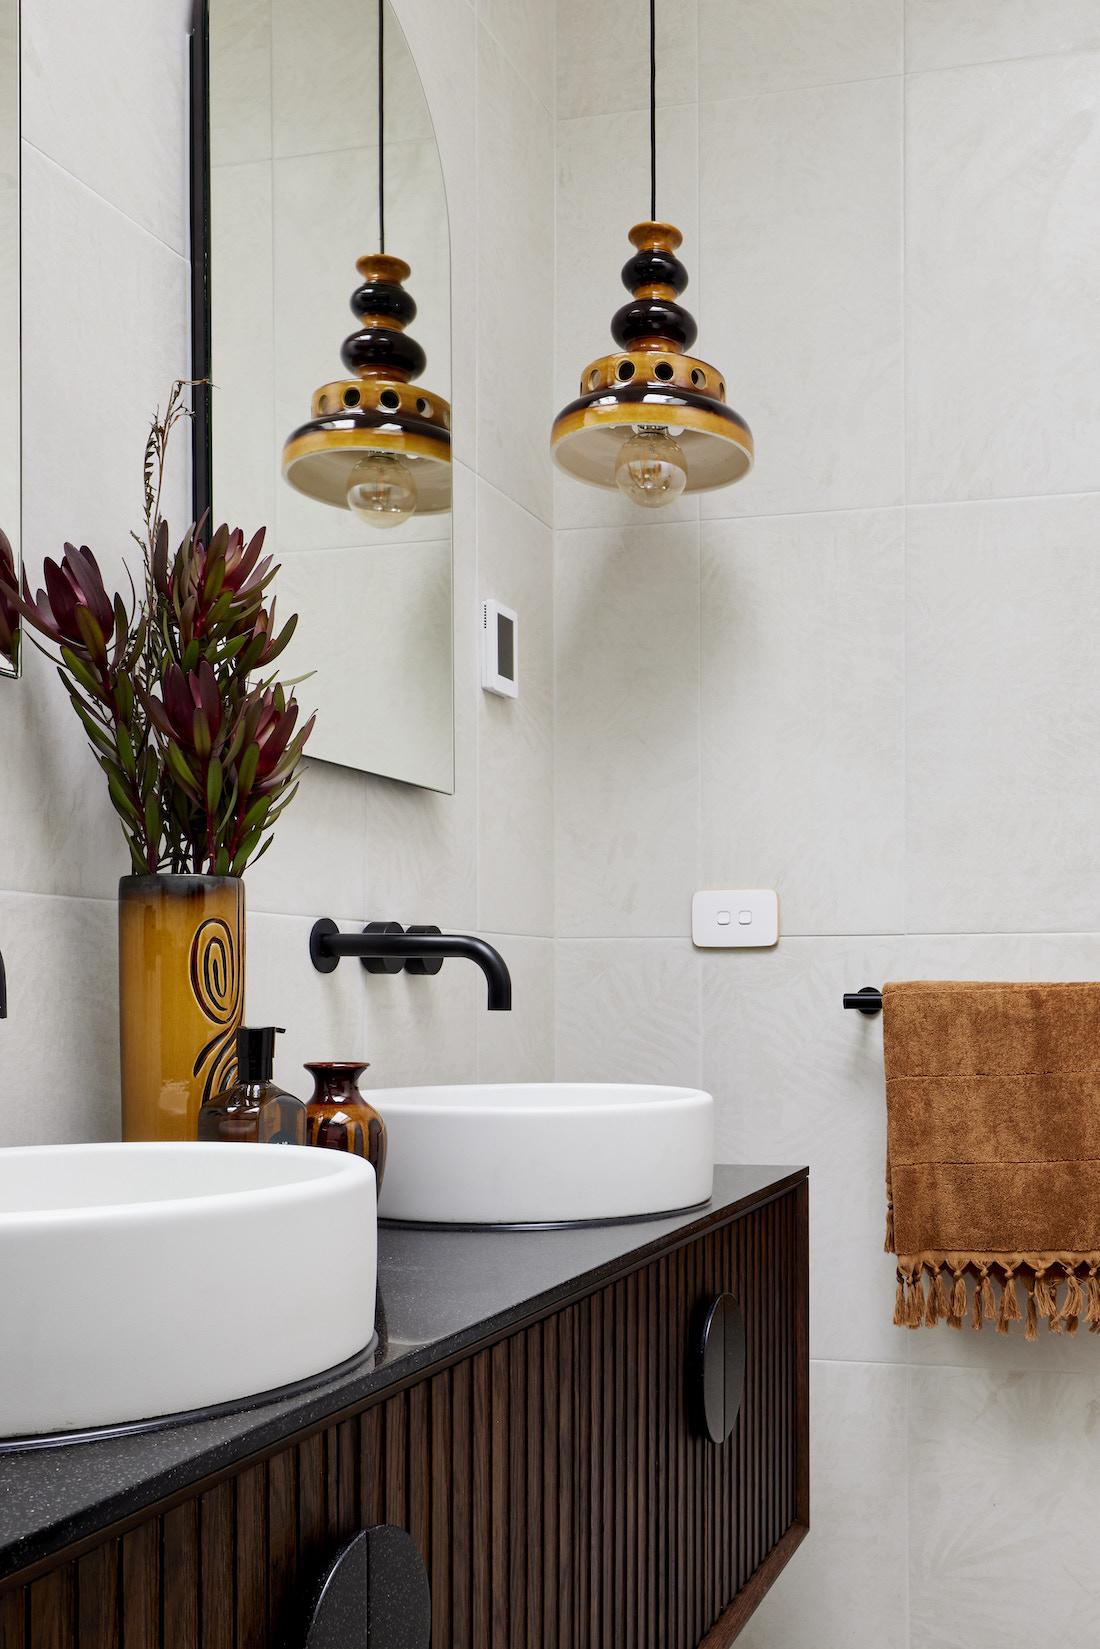 Retro light in modern vintage bathroom